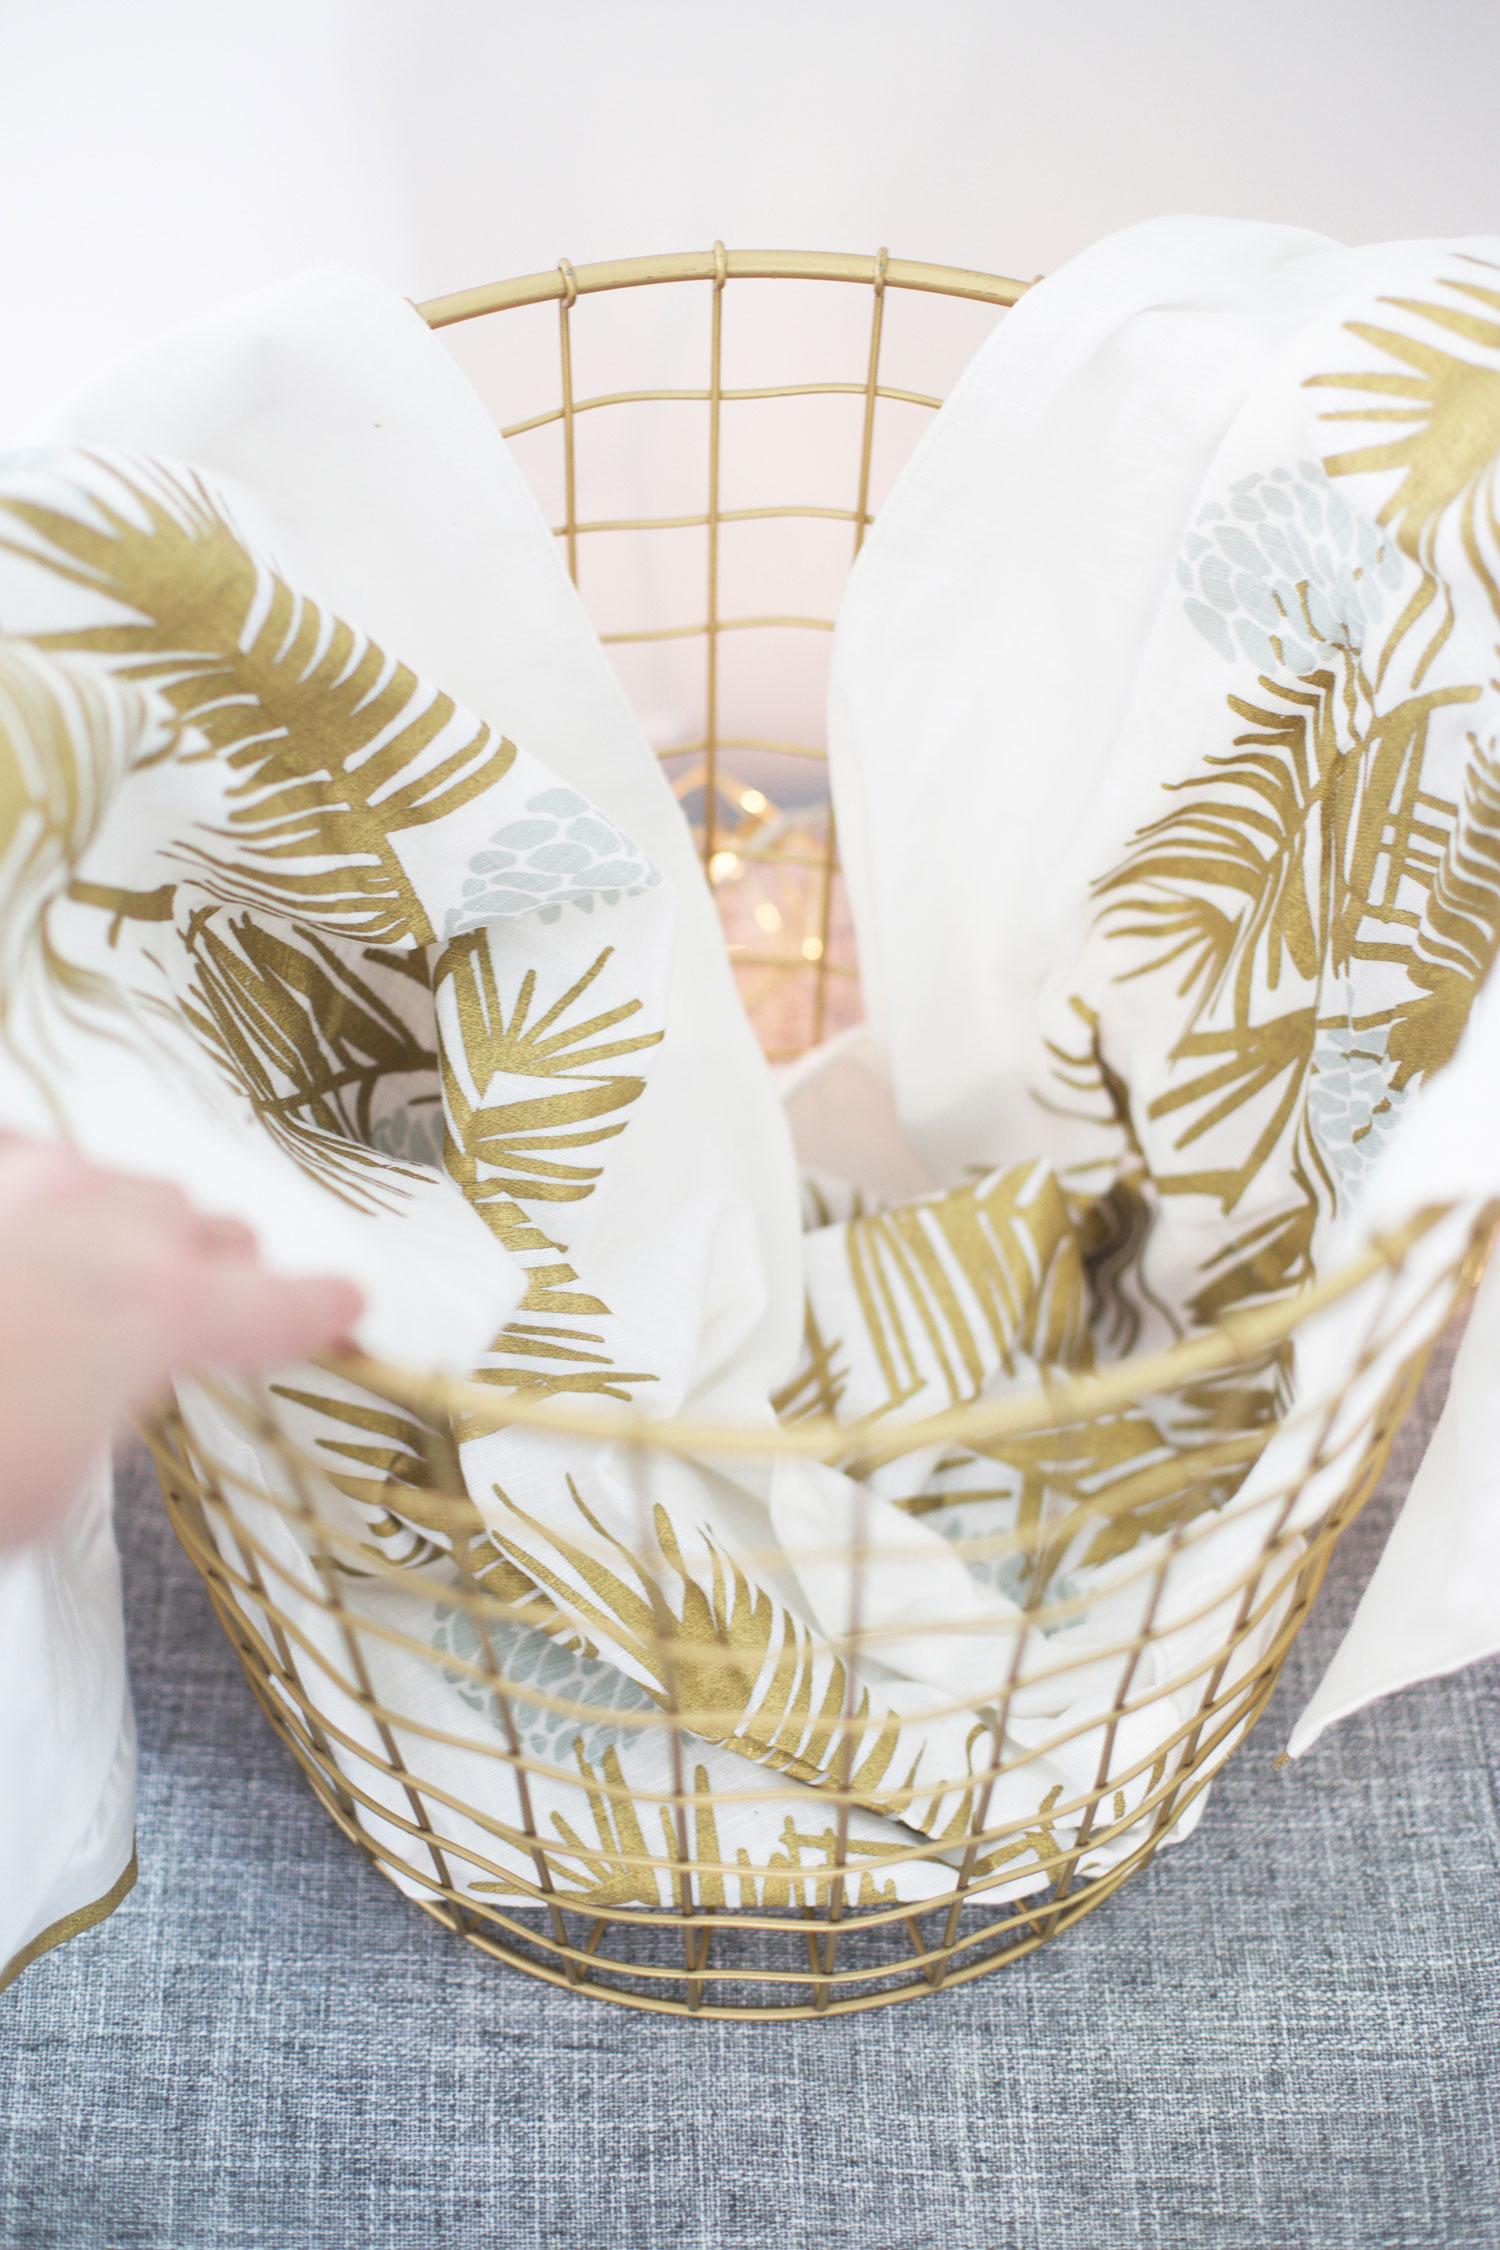 putting together a gift basket